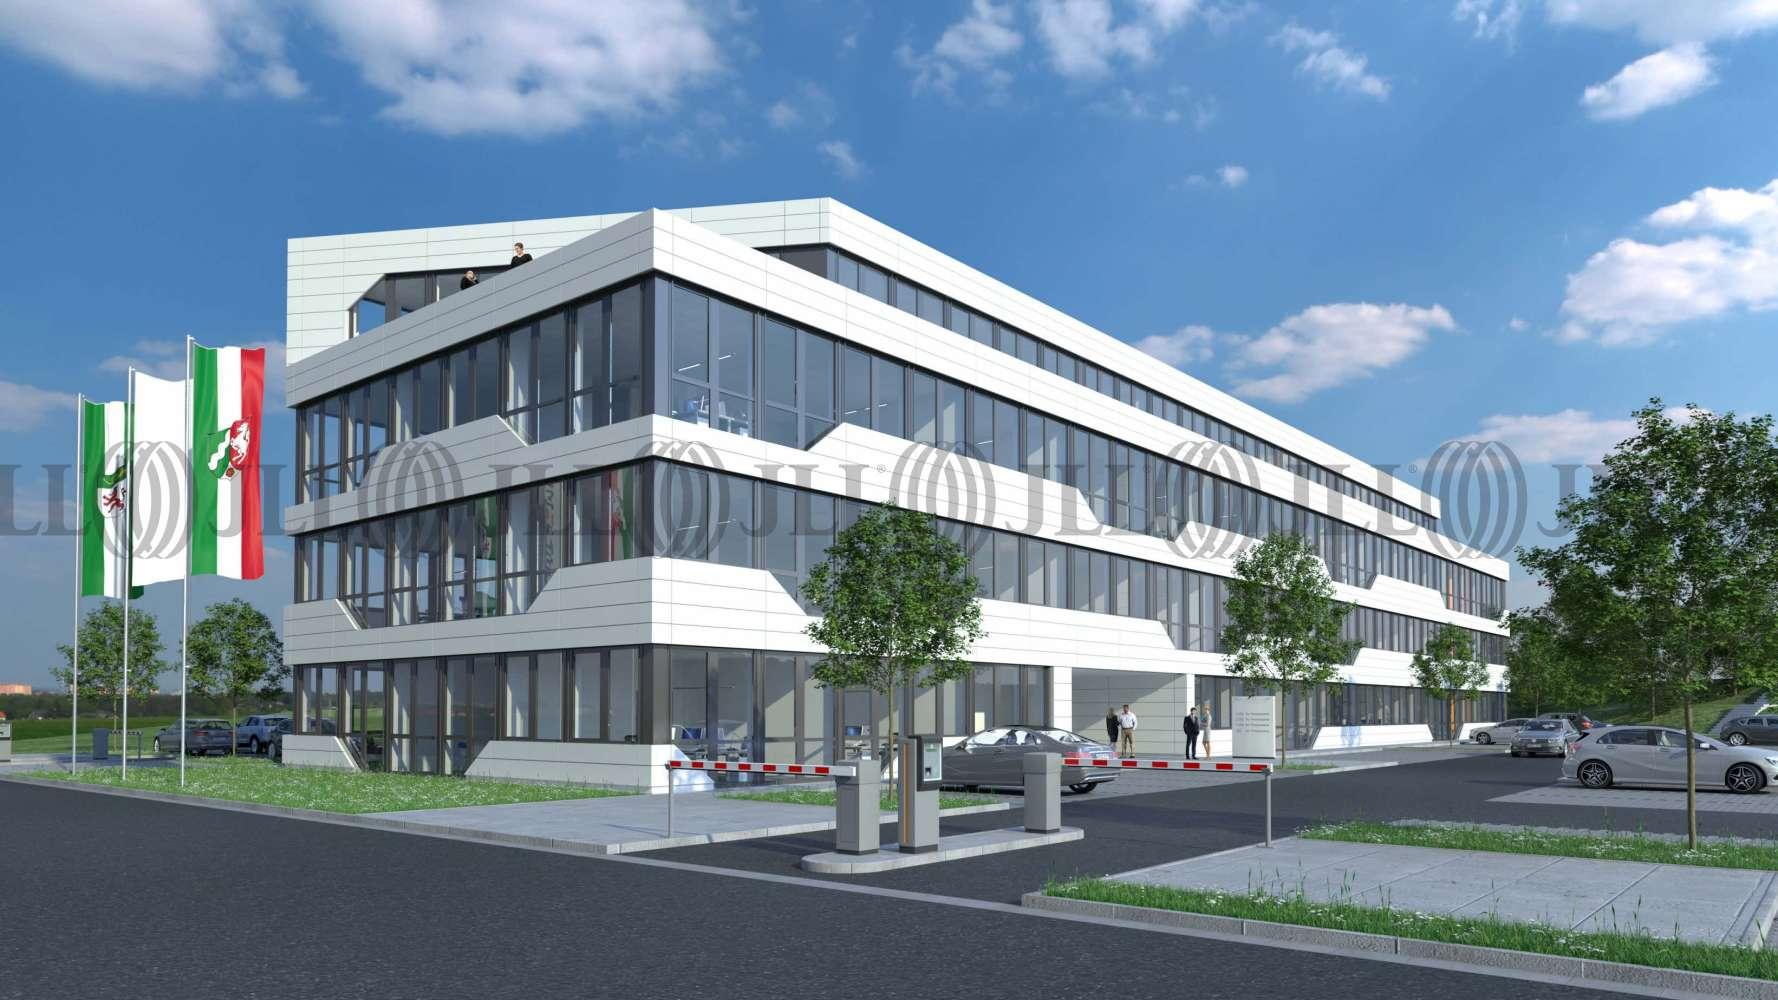 Büros Langenfeld (rheinland), 40764 - Büro - Langenfeld (Rheinland), Berghausen - D2339 - 9575389